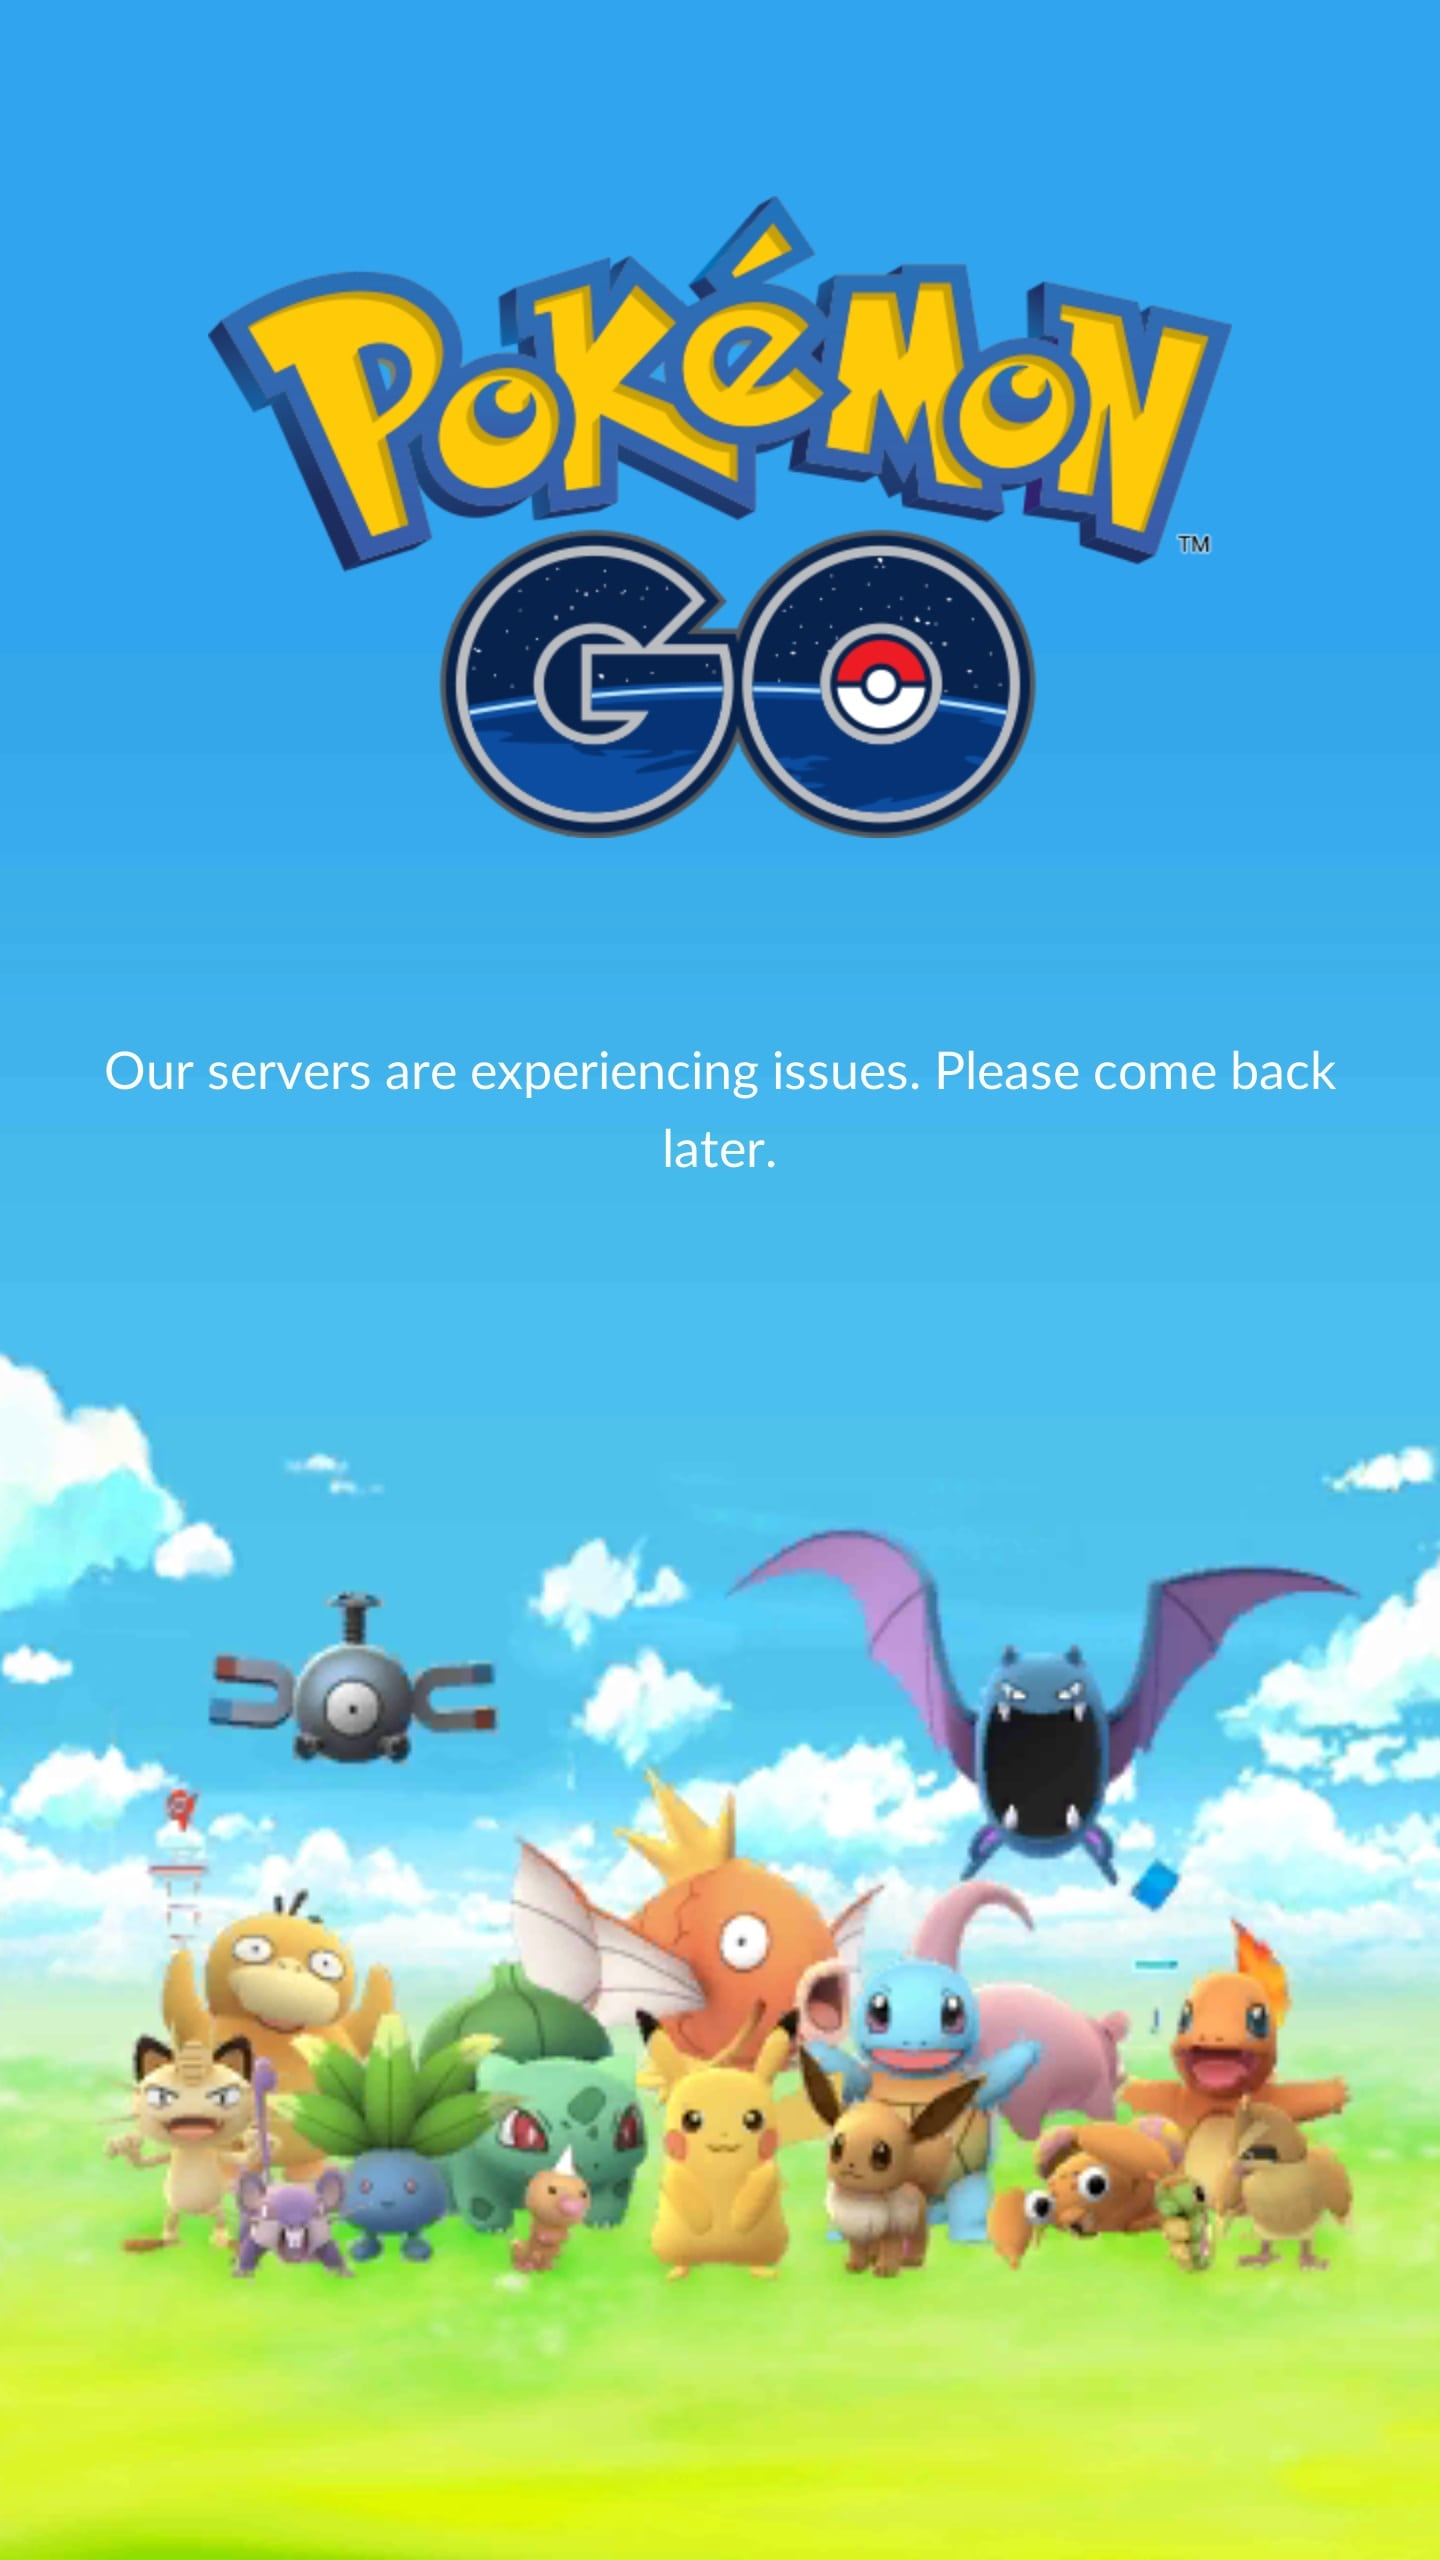 Pokemon Go Backgrounds